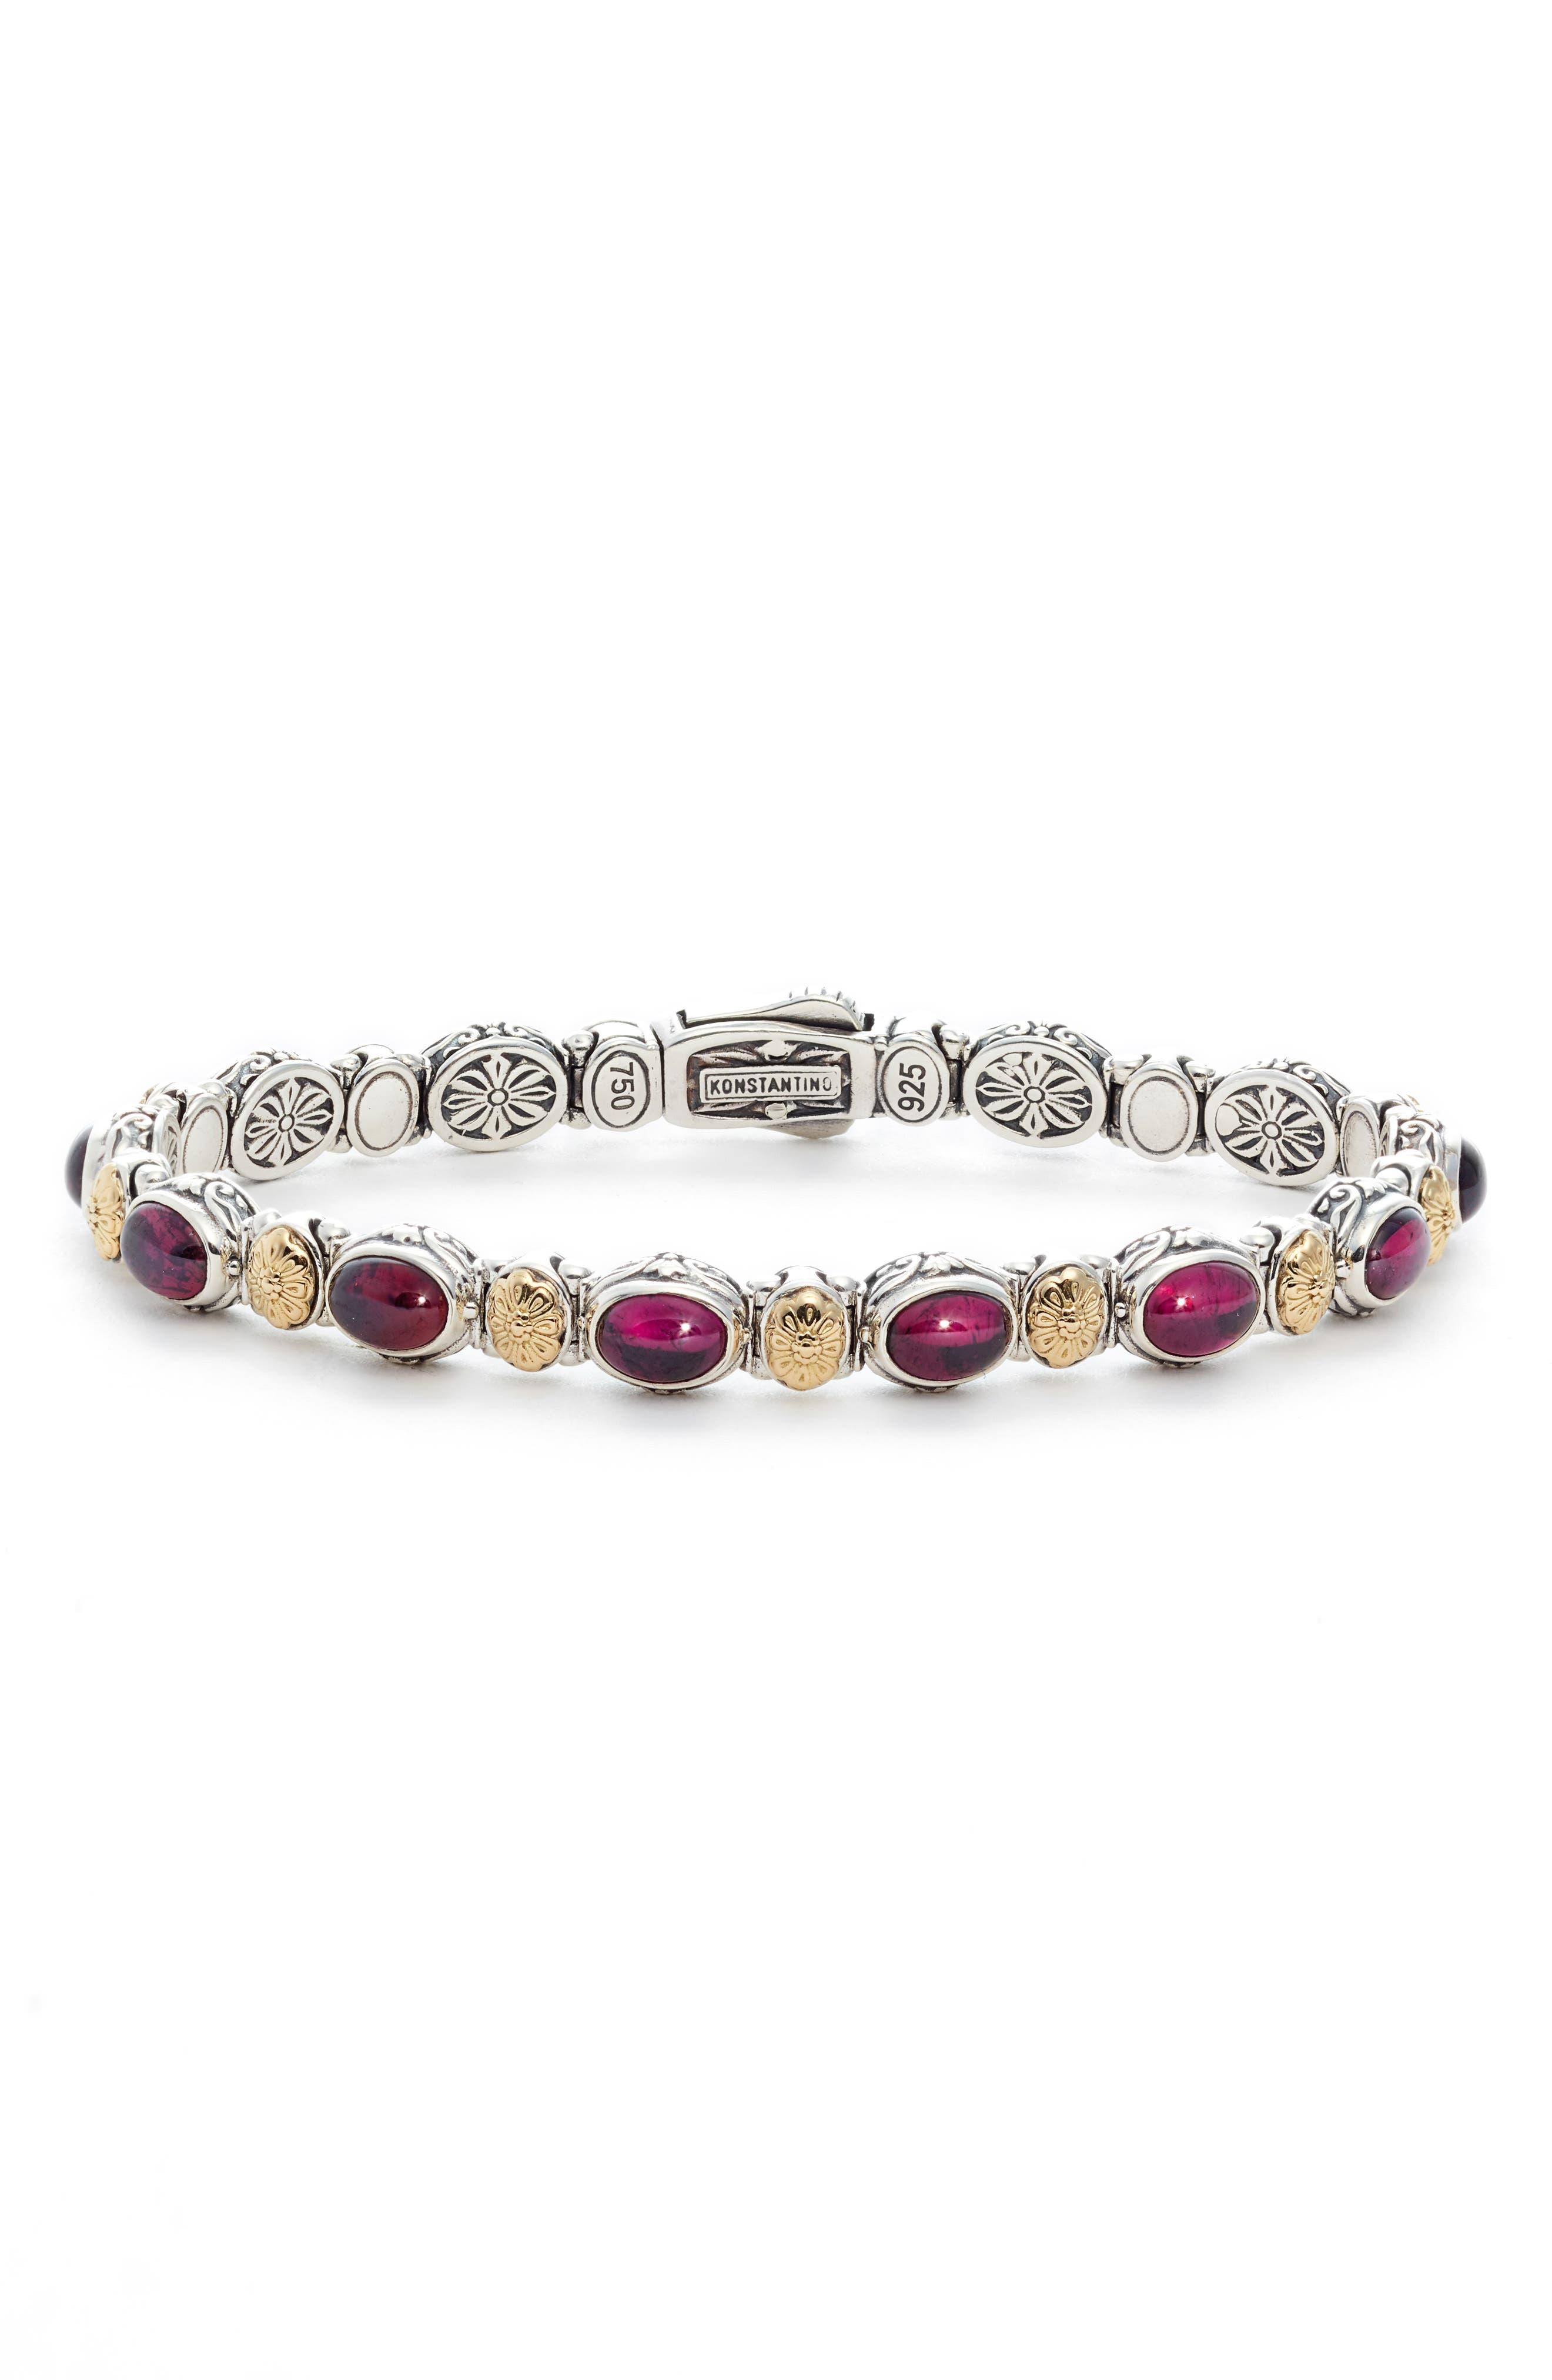 Silver Rhodolite Garnet Bracelet,                             Main thumbnail 1, color,                             Red/ Silver/ Gold